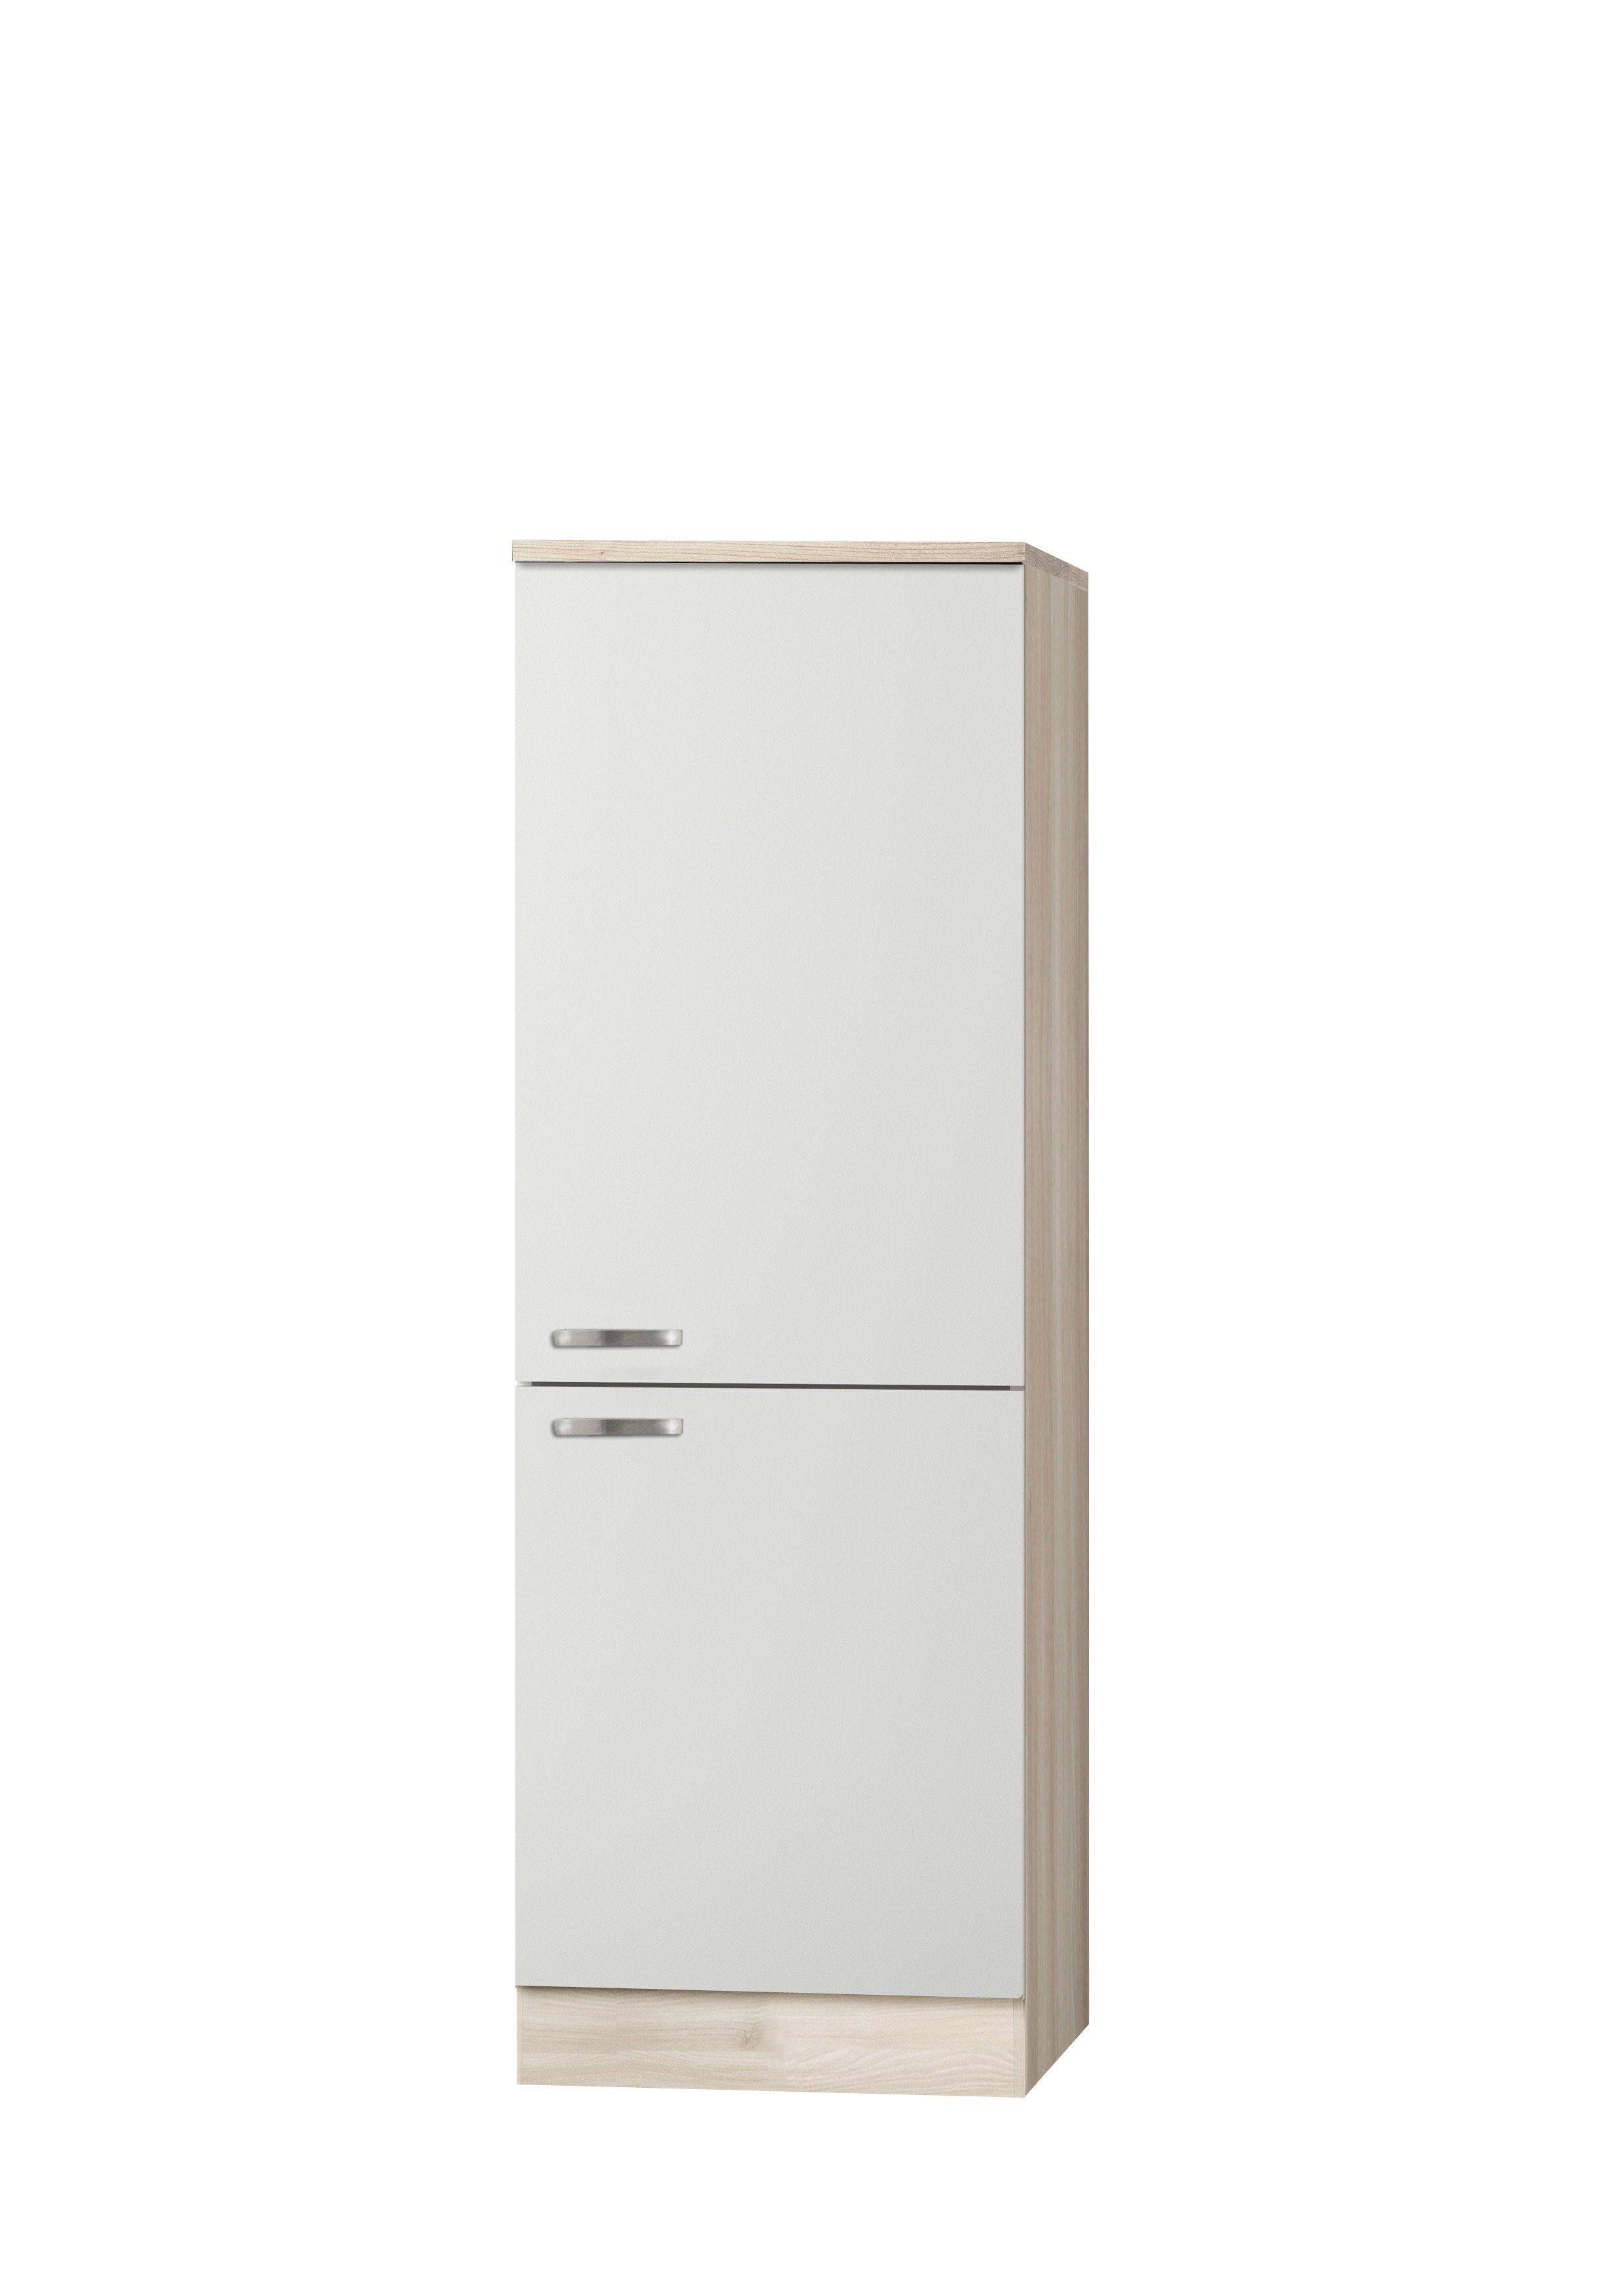 OPTIFIT Kühlumbauschrank »Skagen, Höhe 174,4 cm«